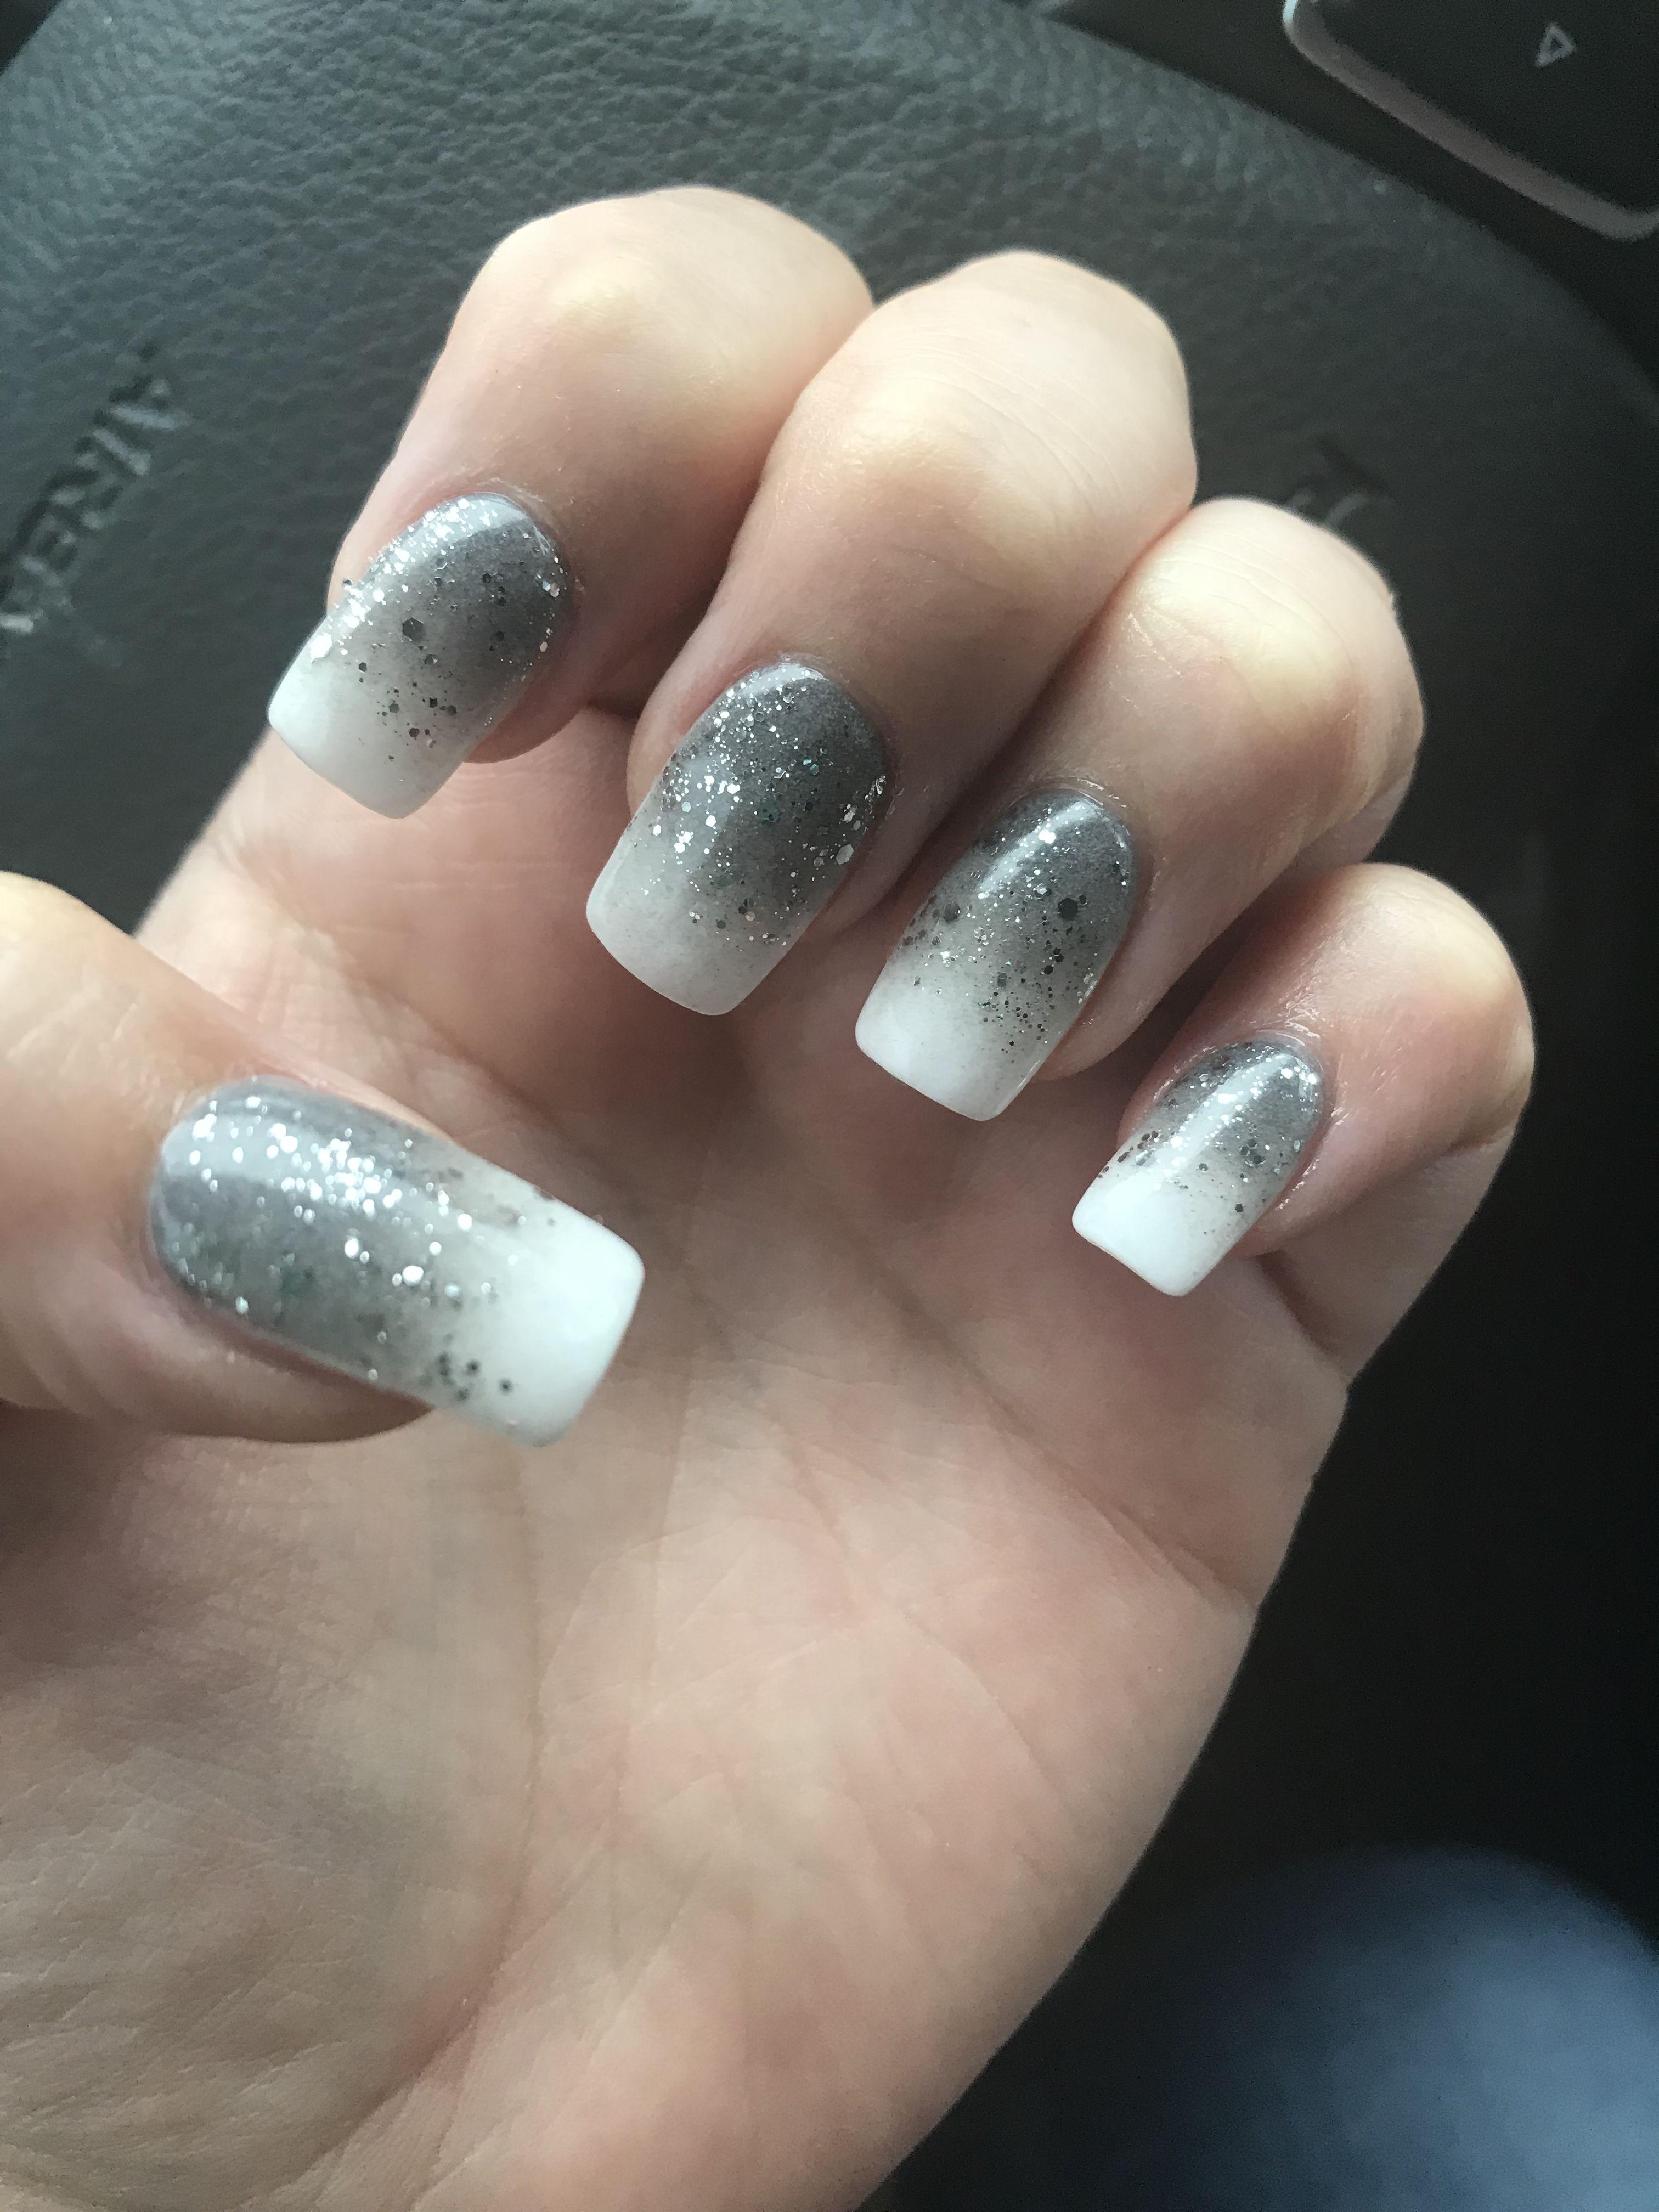 Ombre Snsnails Grey White Sparkles Nails Long Beautiful Pink Ombre Nails White Sparkle Nails Sns Nails